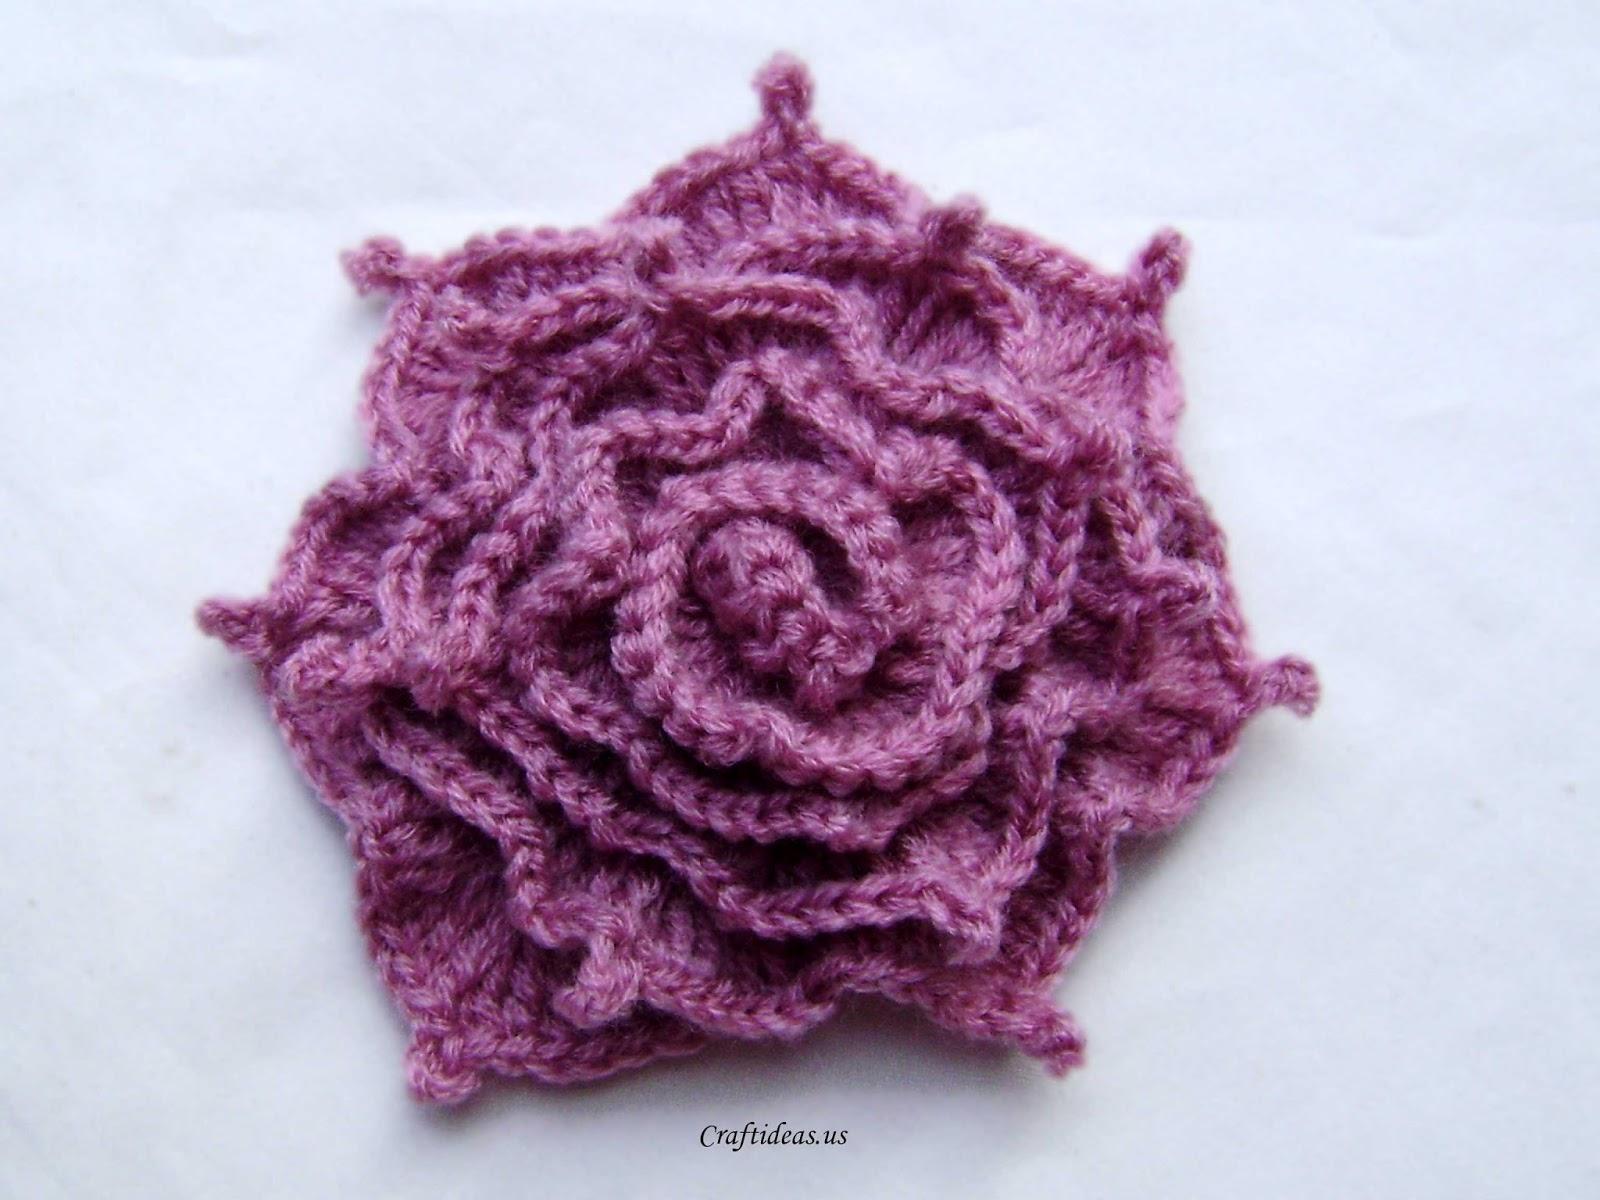 ergahandmade: Crochet Rose + Free Pattern Step By Step